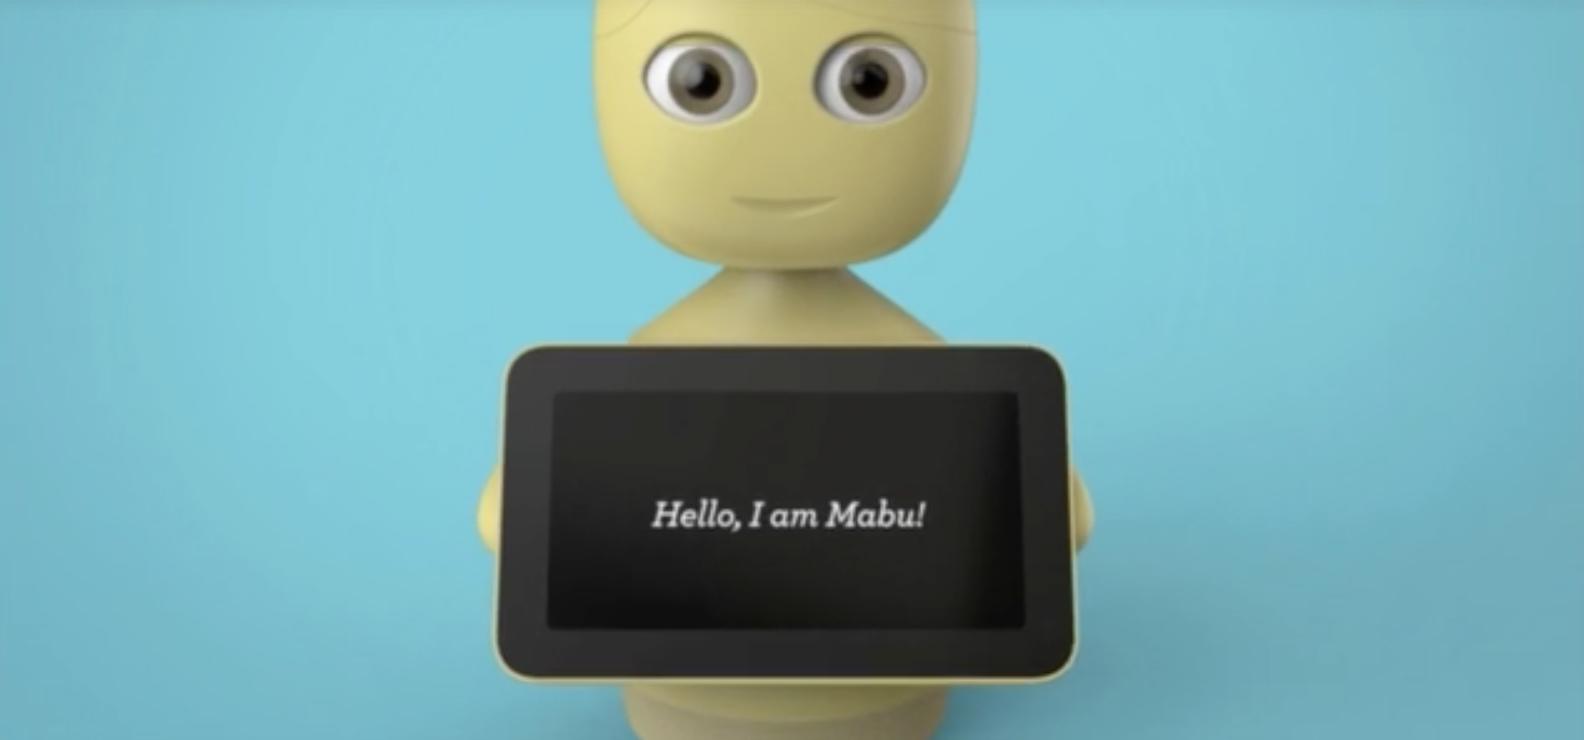 Mabu emotion recognition healthcare companion robot